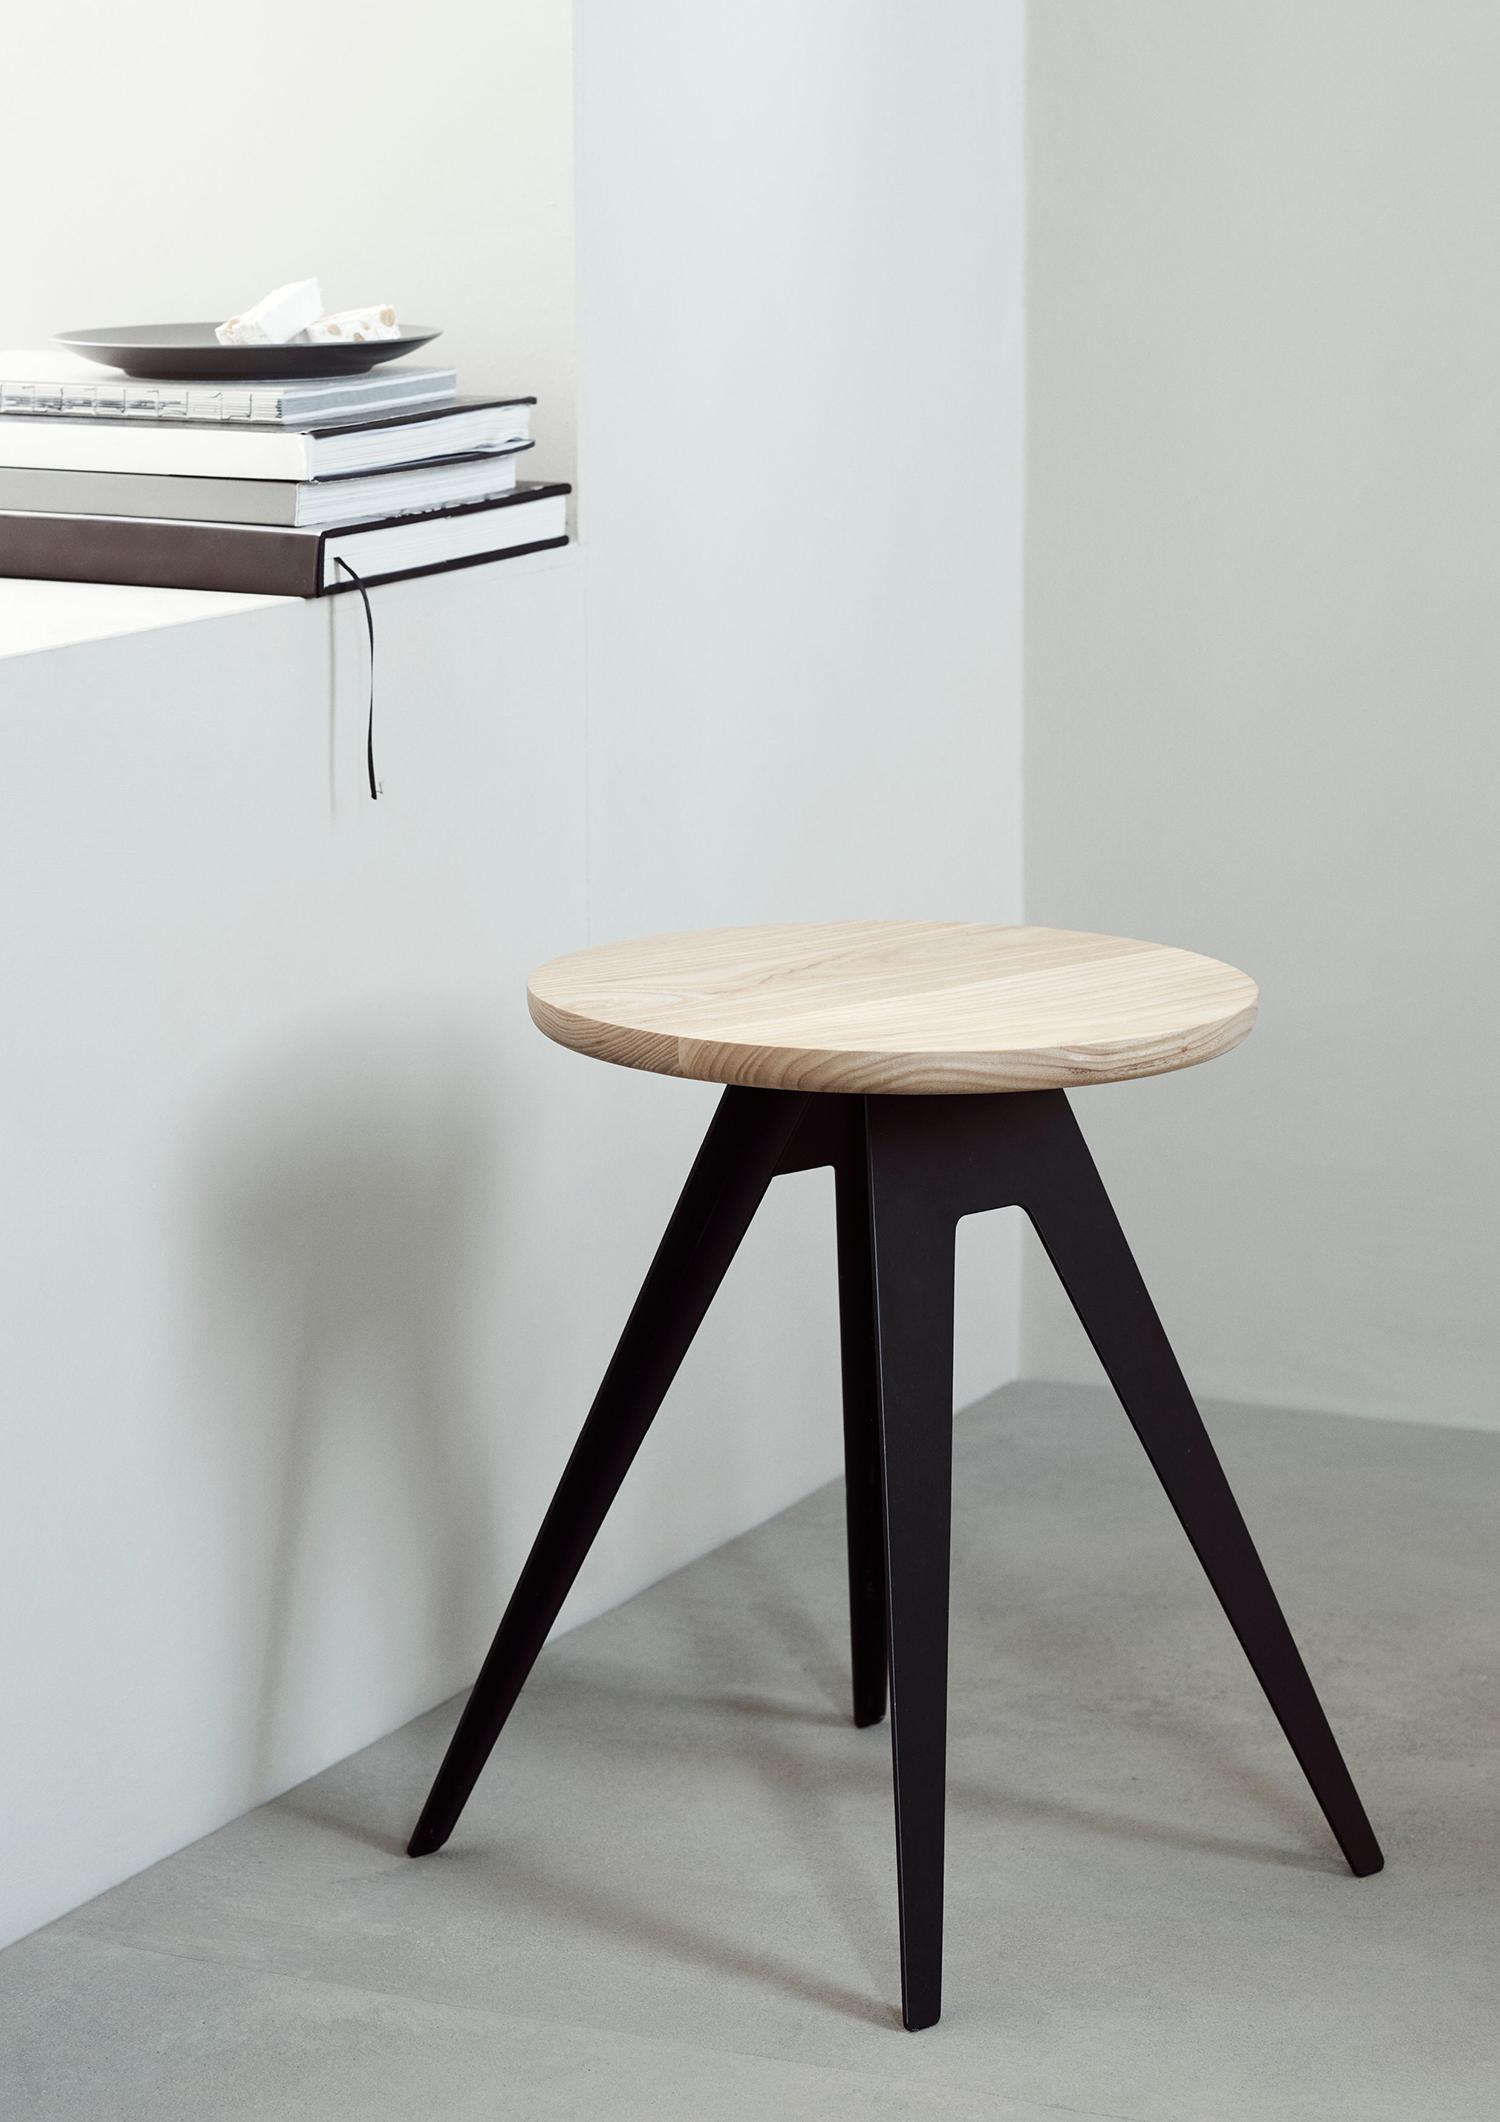 H&M meubelcollectie Kruk